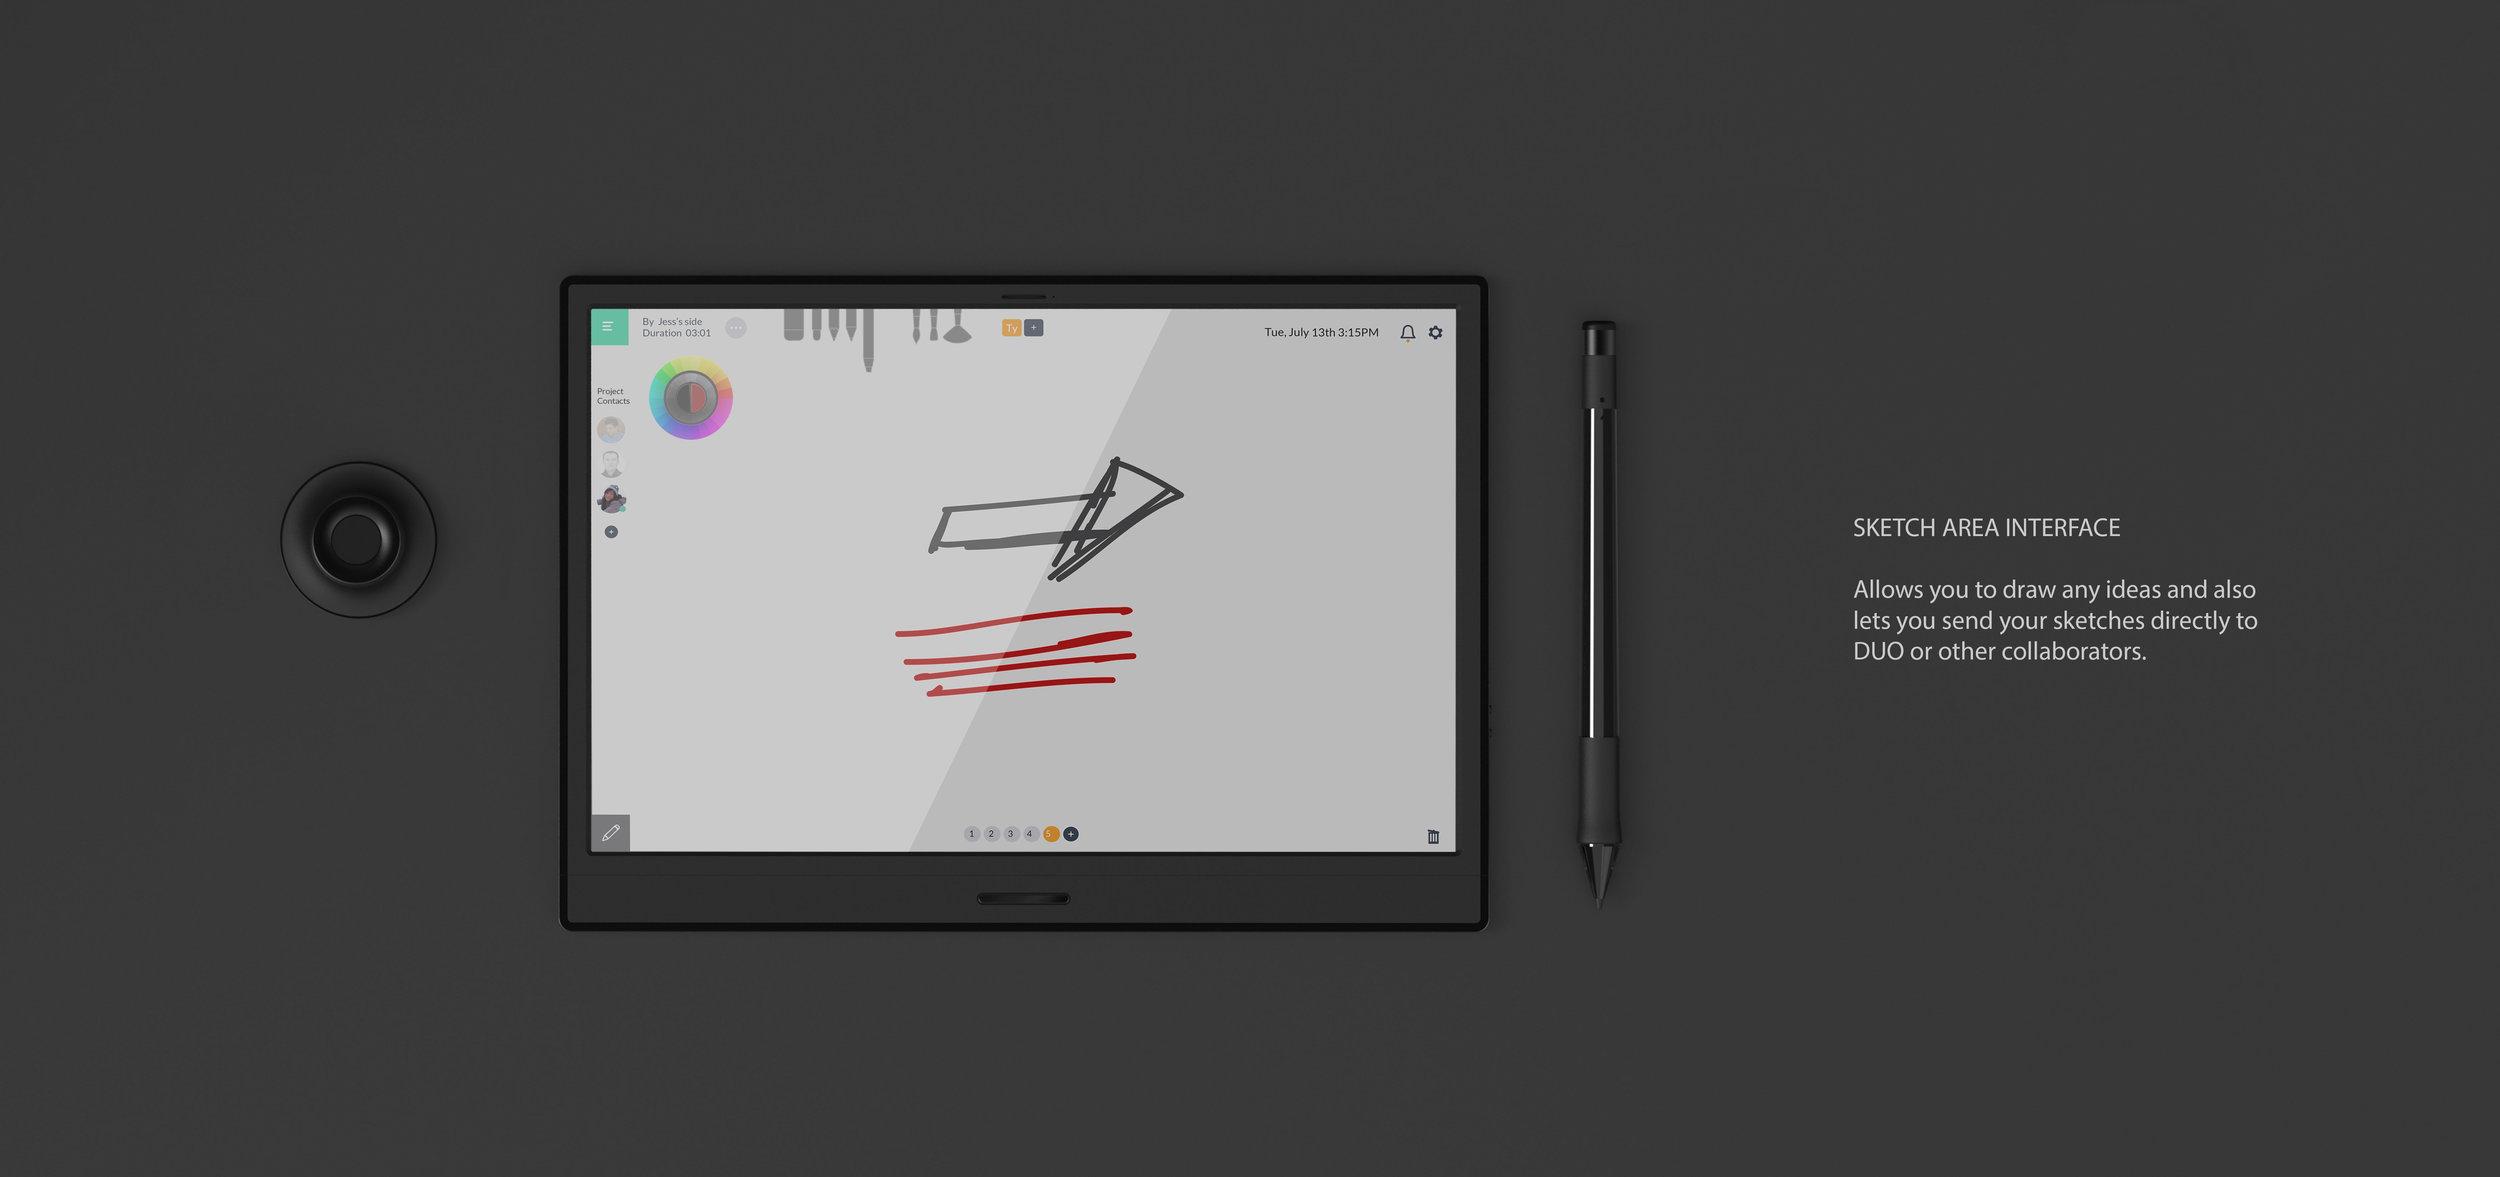 SIDE_UNO_interface-07.jpg